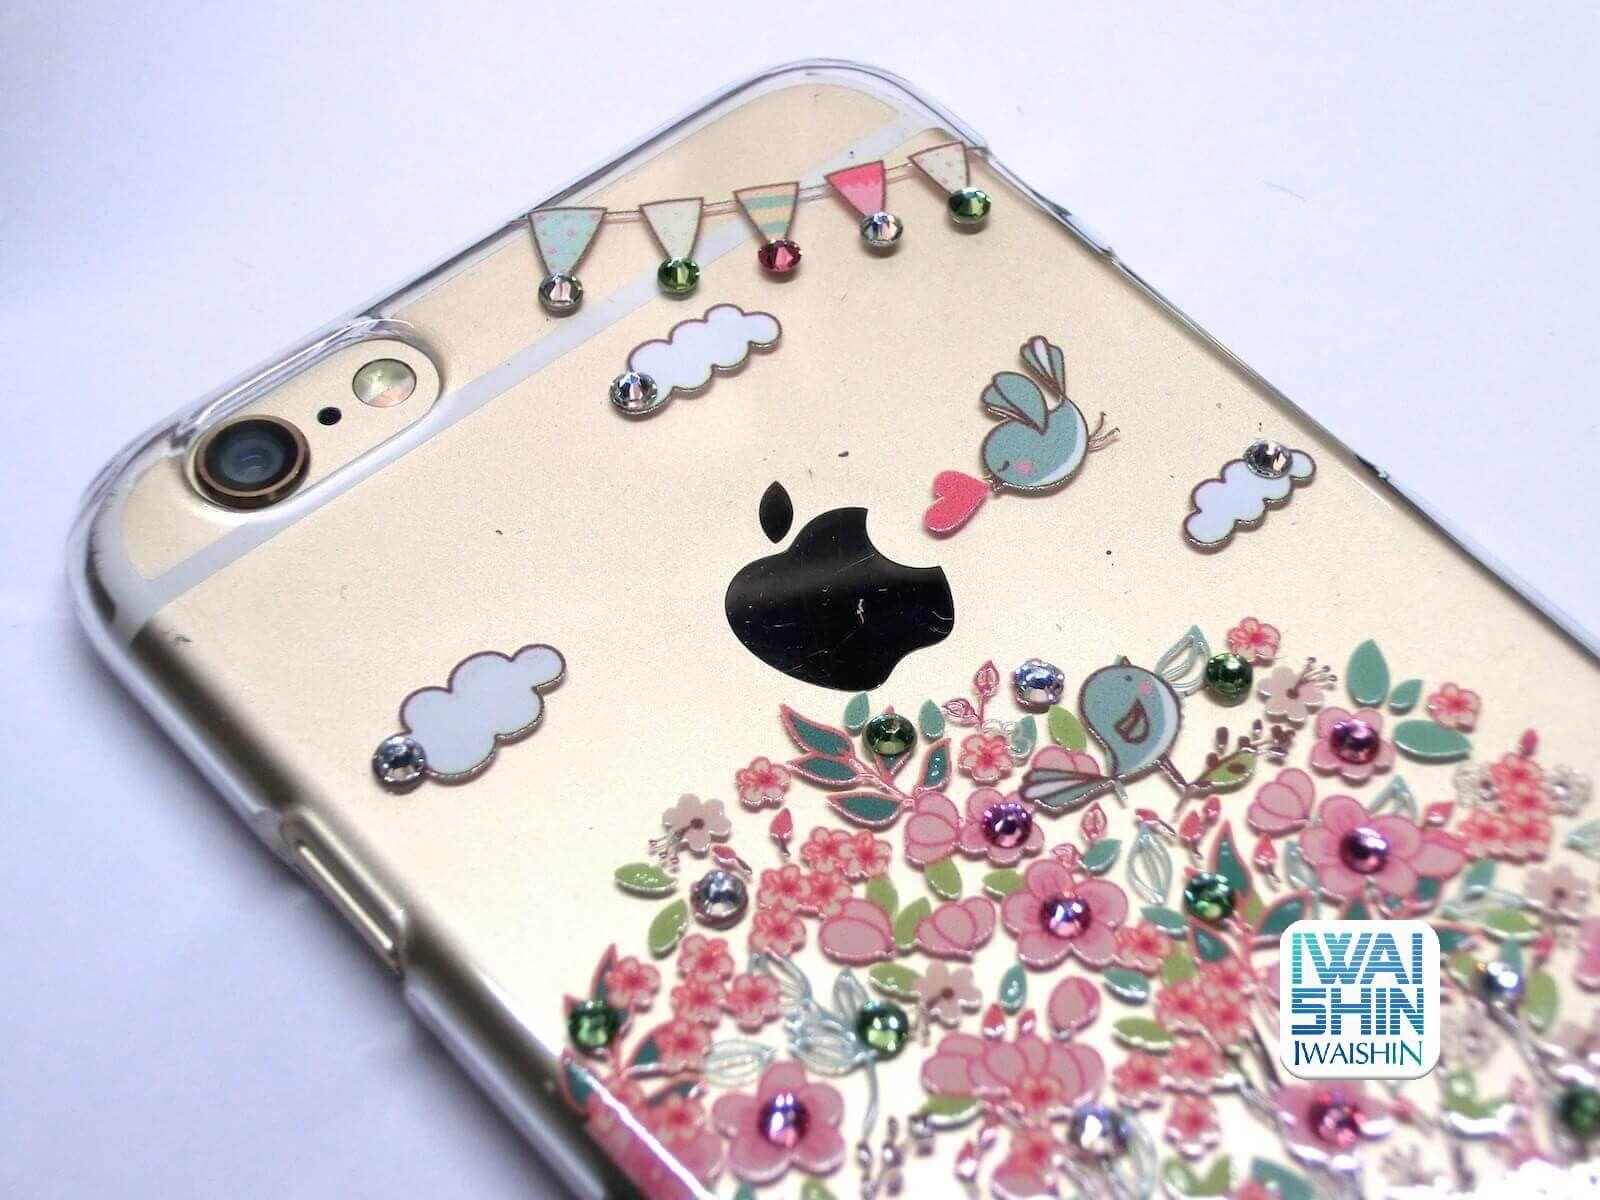 APBS 施華洛世奇 IPhone 6 保護殼5753